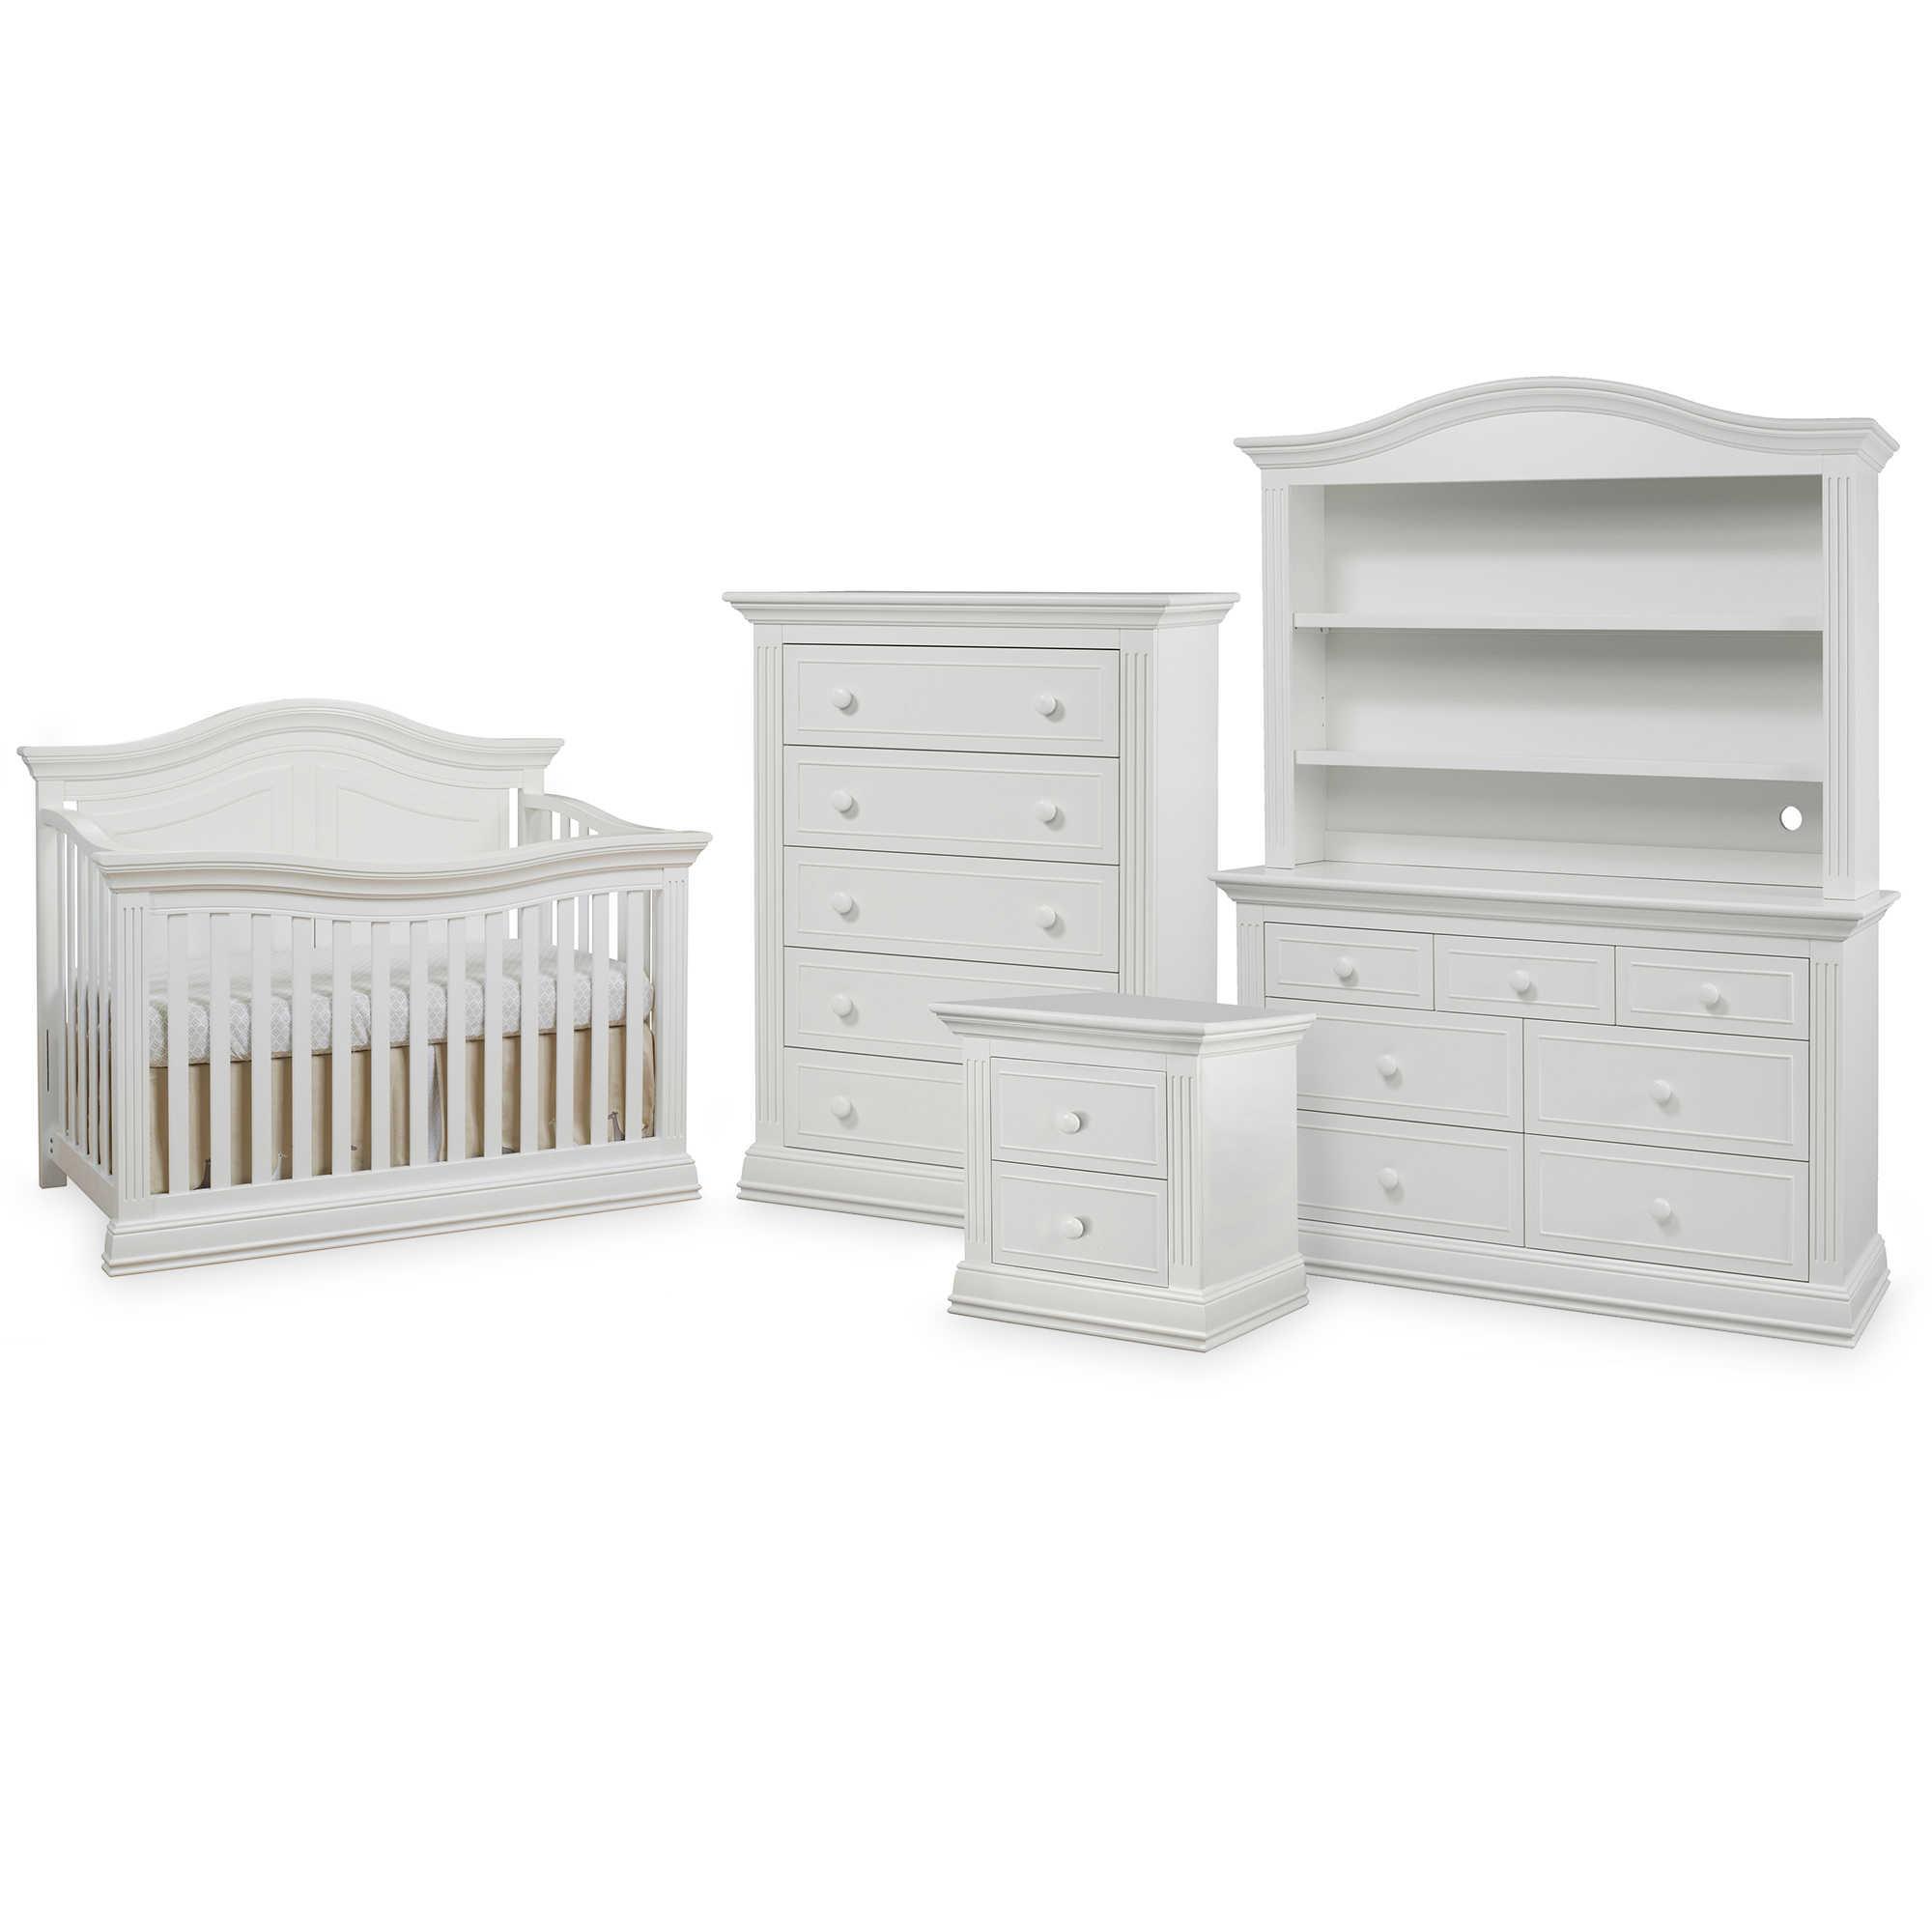 Davinci furniture perancis furniture standing clock mirror contact us - Sorelle Providence Nursery Furniture Collection In White